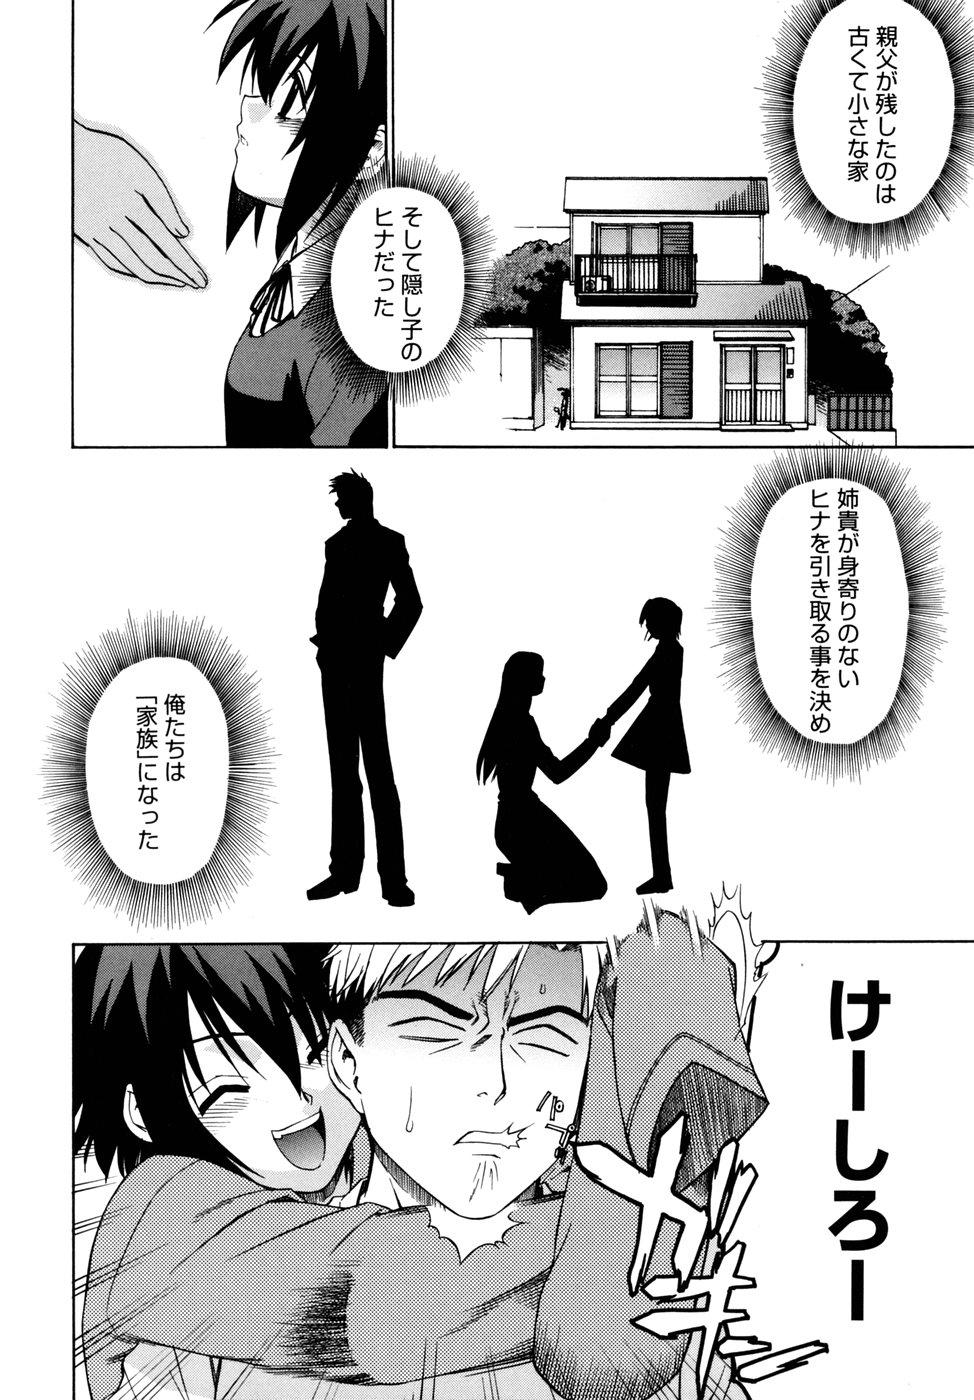 [Yaya Hinata] Tonari no Miko-san wa Minna Warau - The next shrine maidens smile in everyone. 201